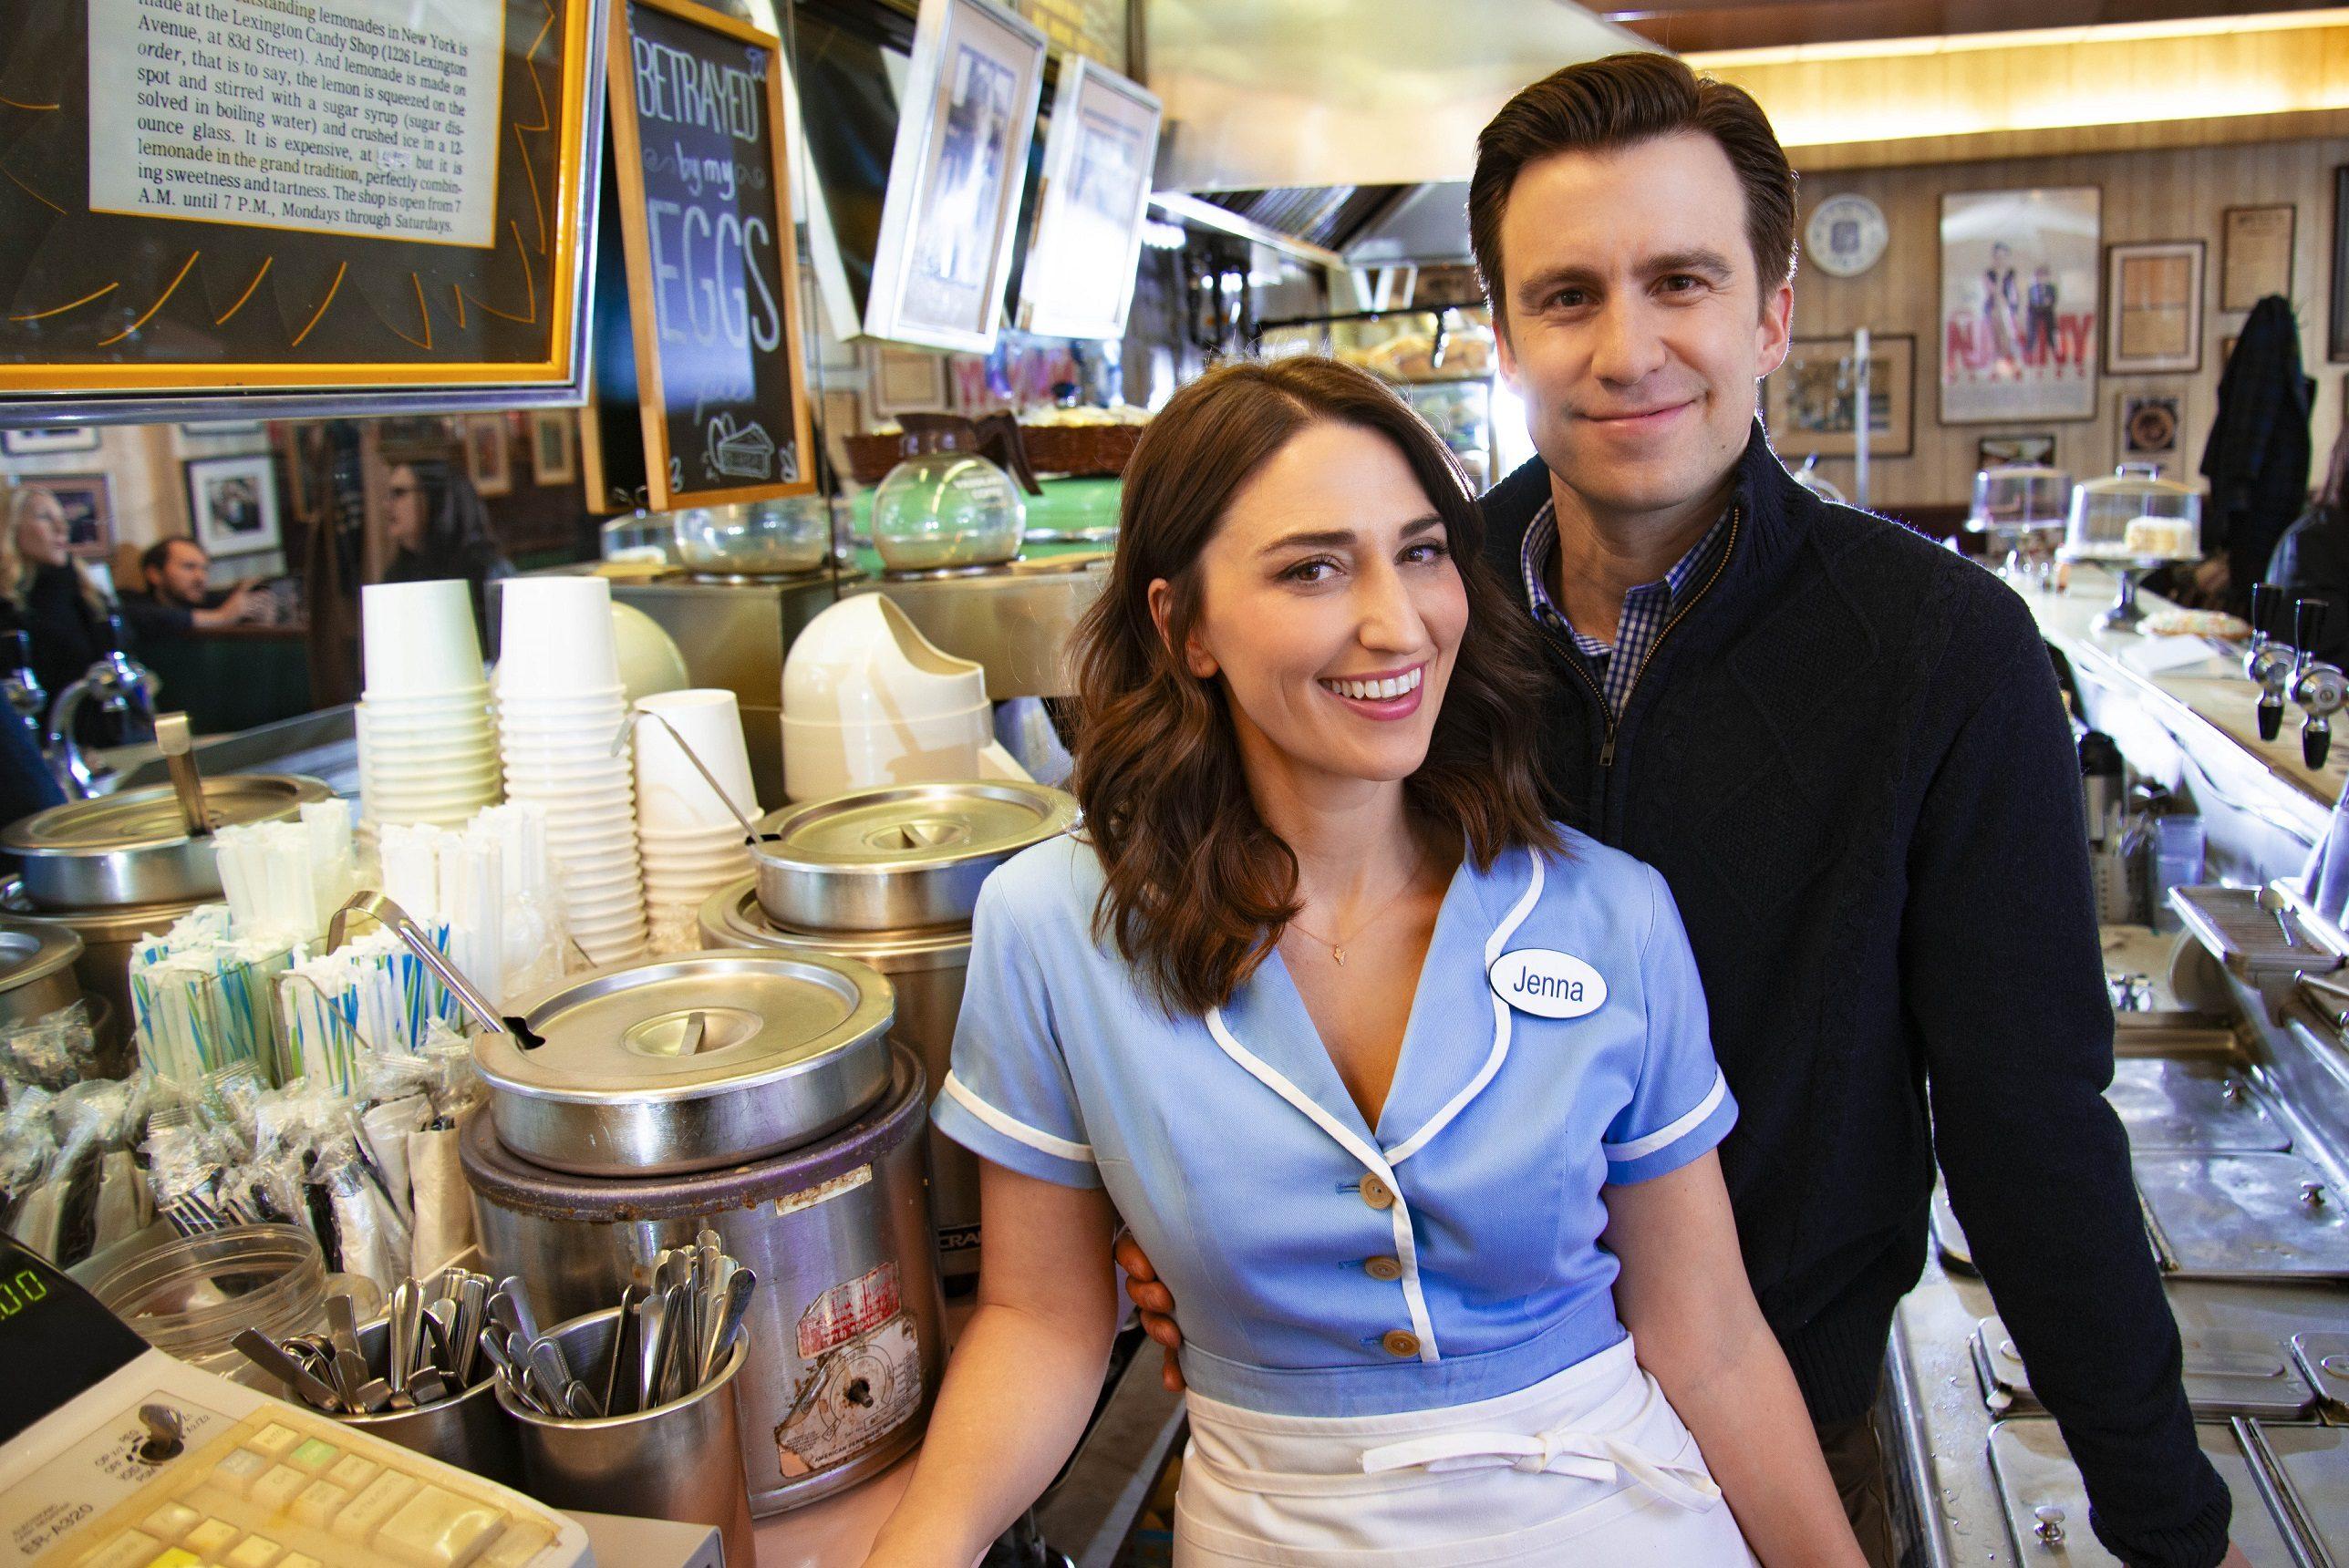 Sara Bareilles and Gavin Creel. Waitress promo image. Credit Shervin Lainez.jpg